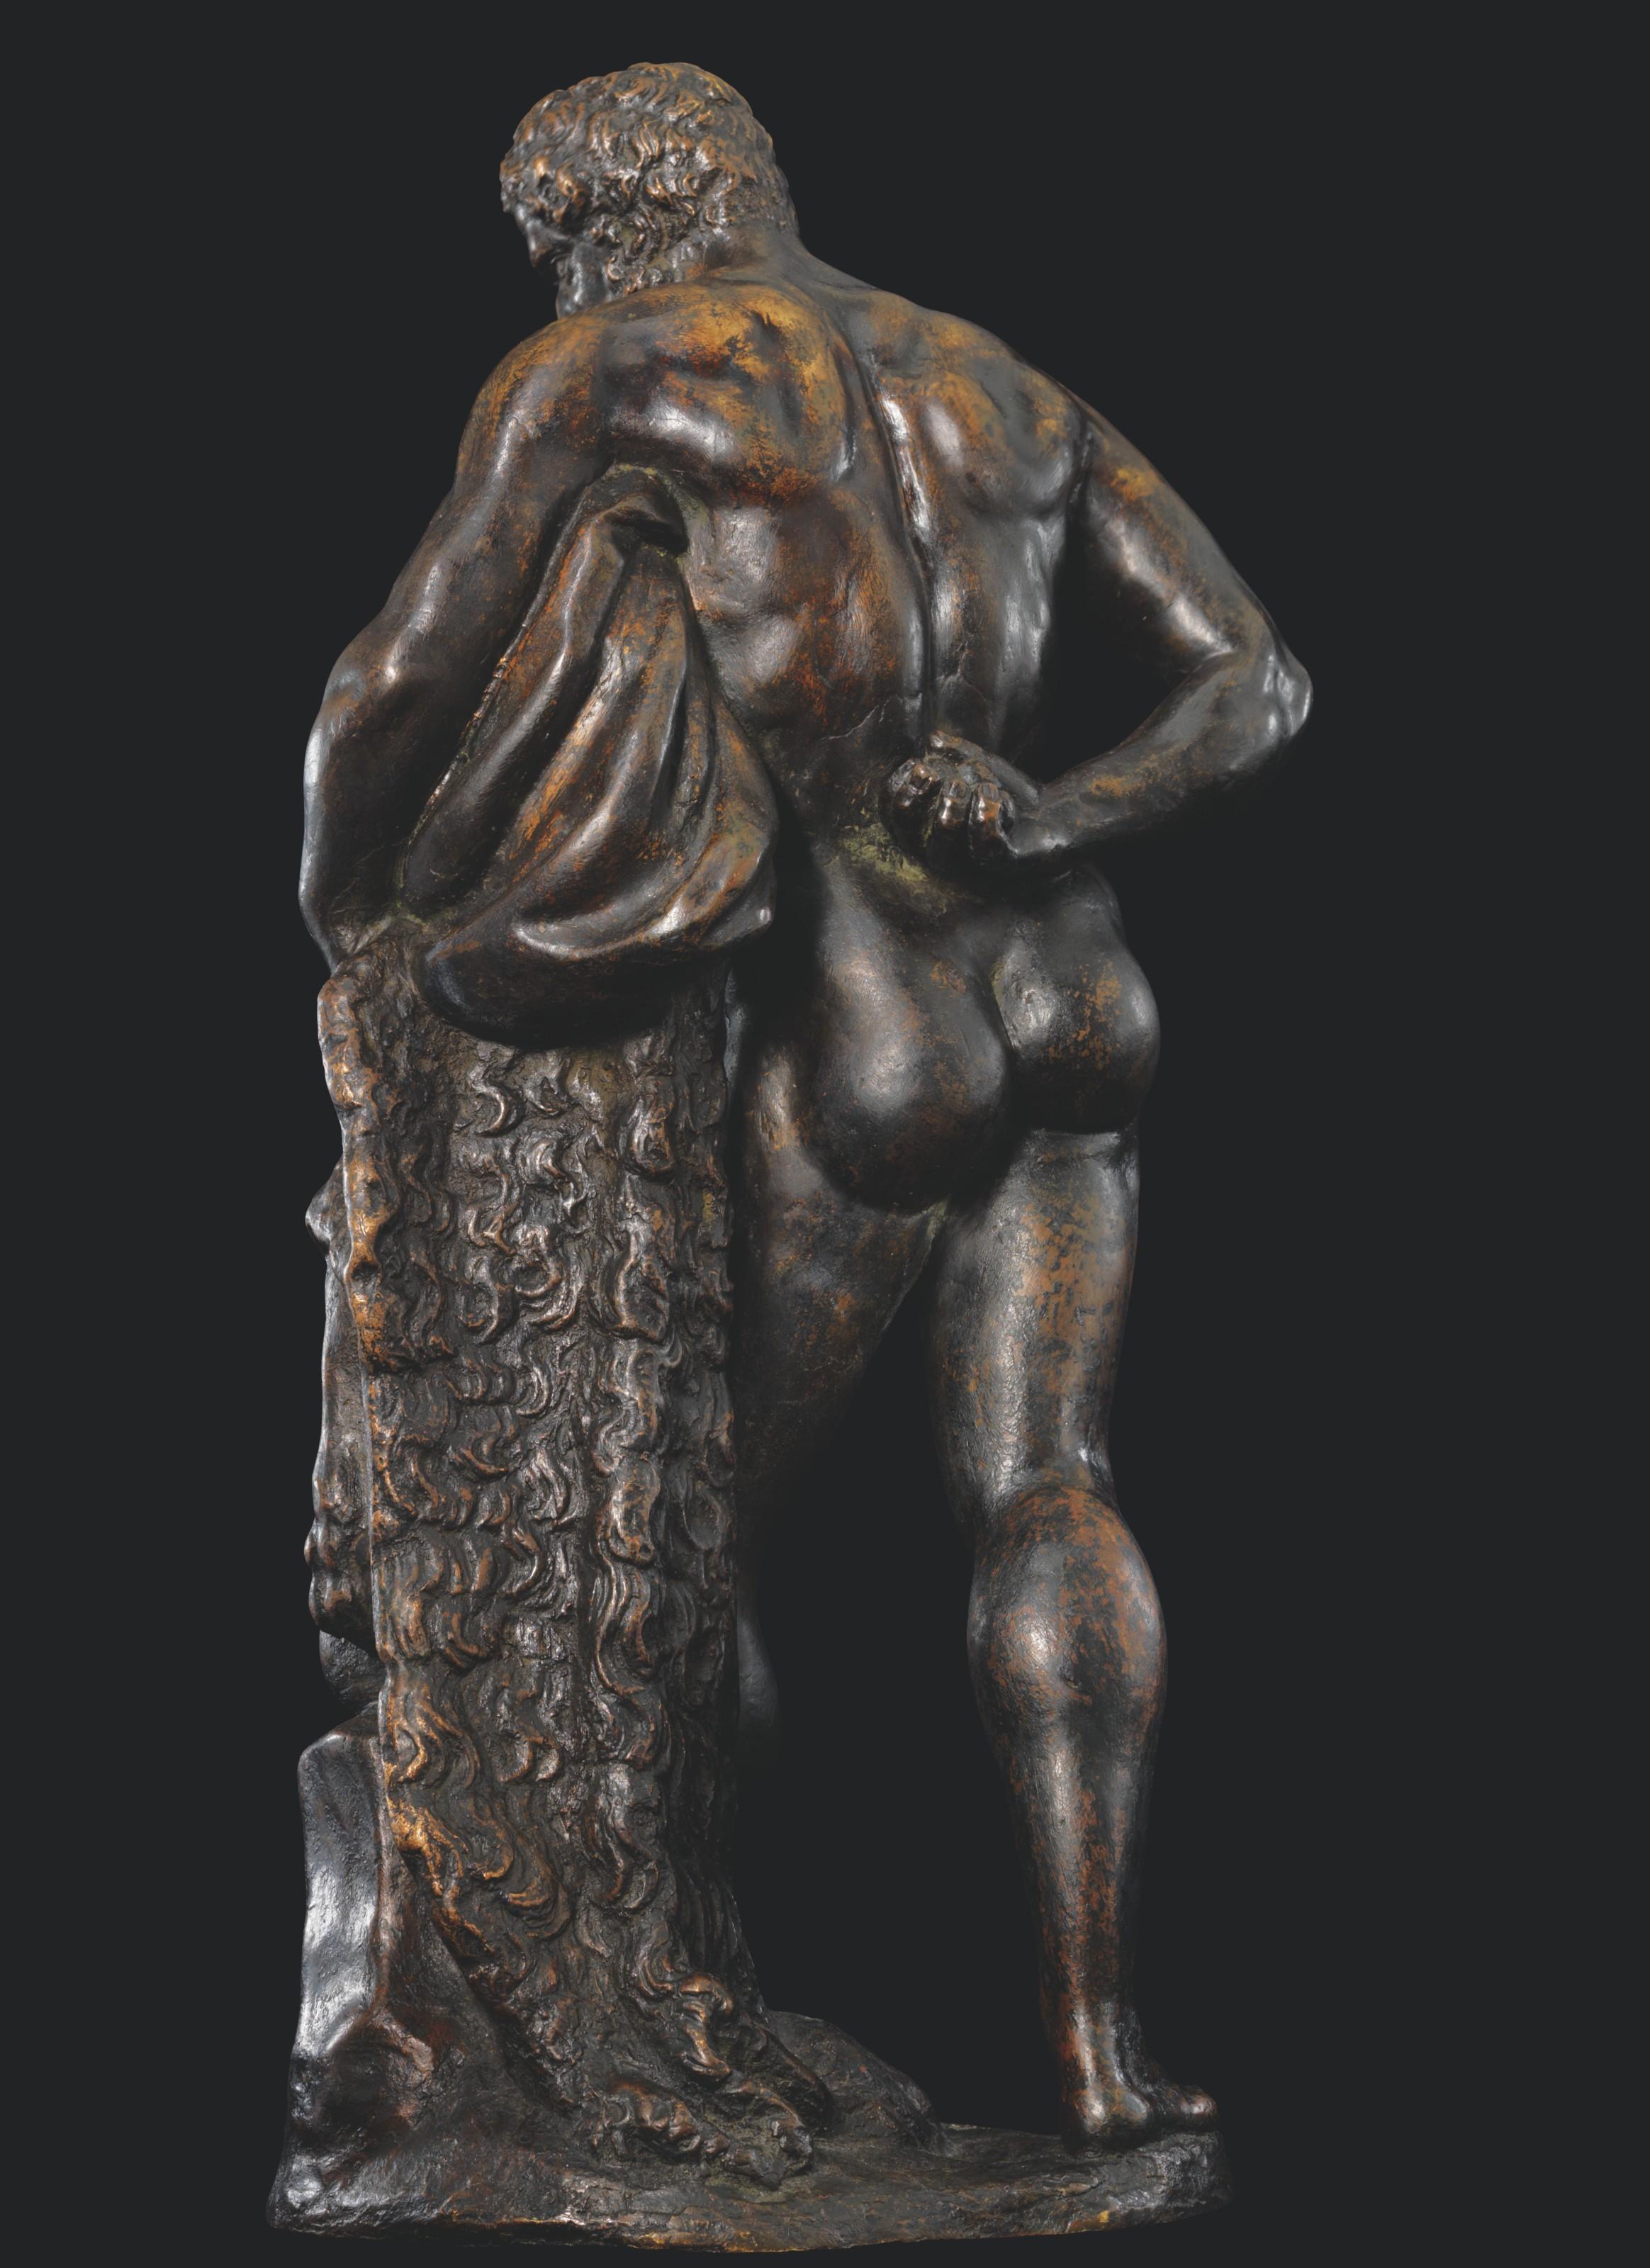 ATTRIBUTED TO WILLEM DANIELSZ VAN TETRODE (?DELFT C. 1525 - 1580), CIRCA 1558-1560